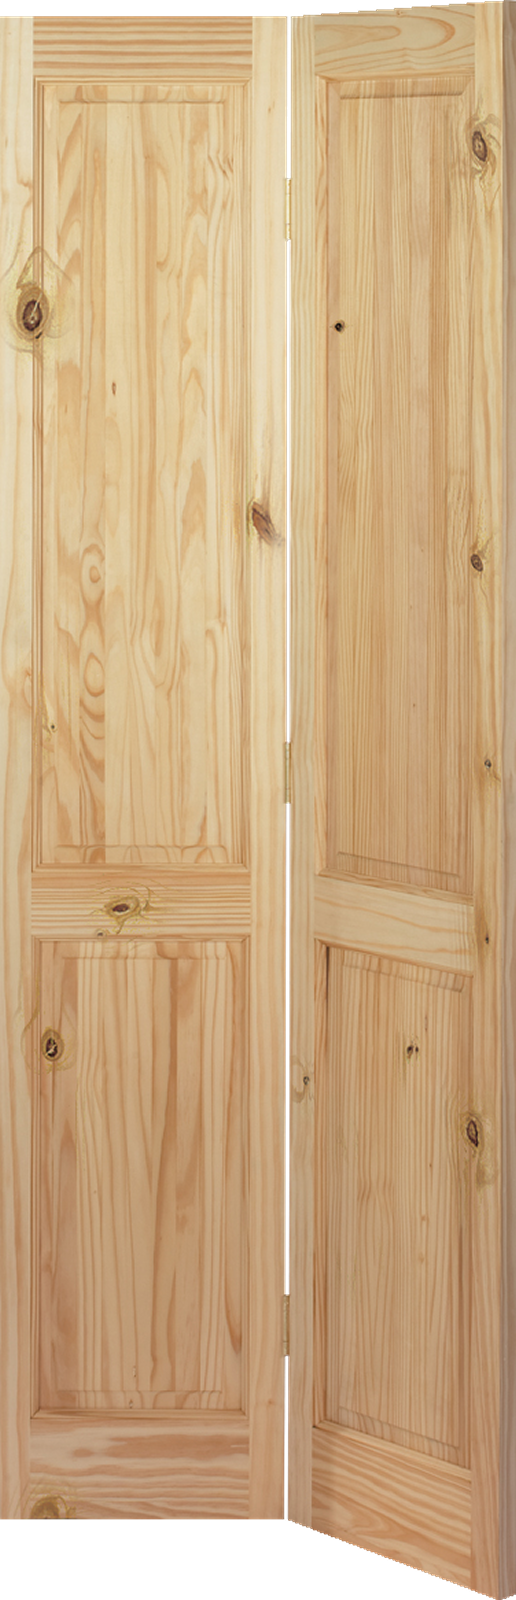 Genial Victorian Panel Knotty Pine Bi Fold Door Png 516x1600 Knotty Pine Bifold  Doors